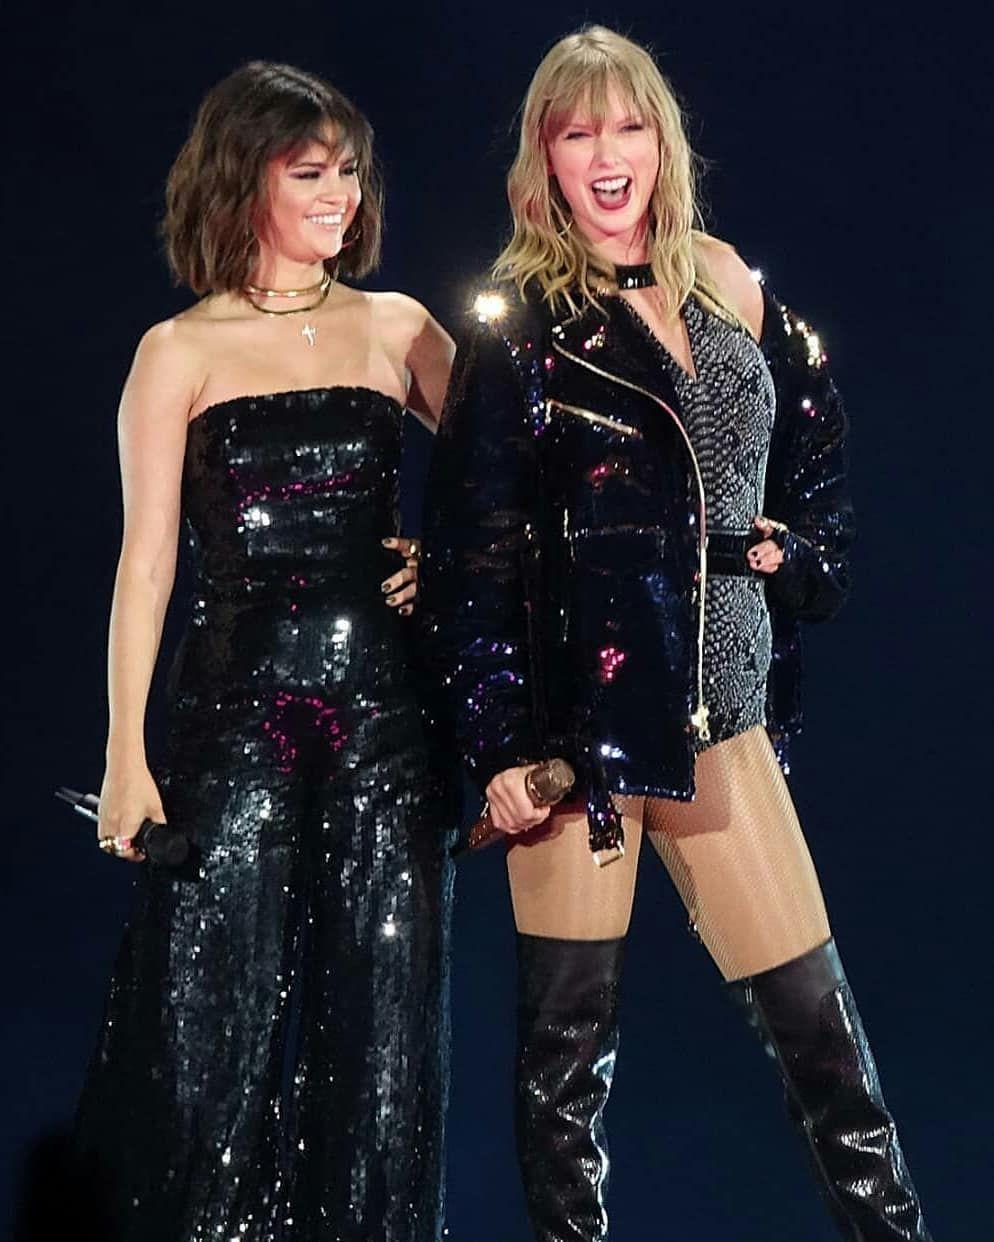 10 Potret Persahabatan Selena Gomez & Taylor Swift yang Bikin Iri